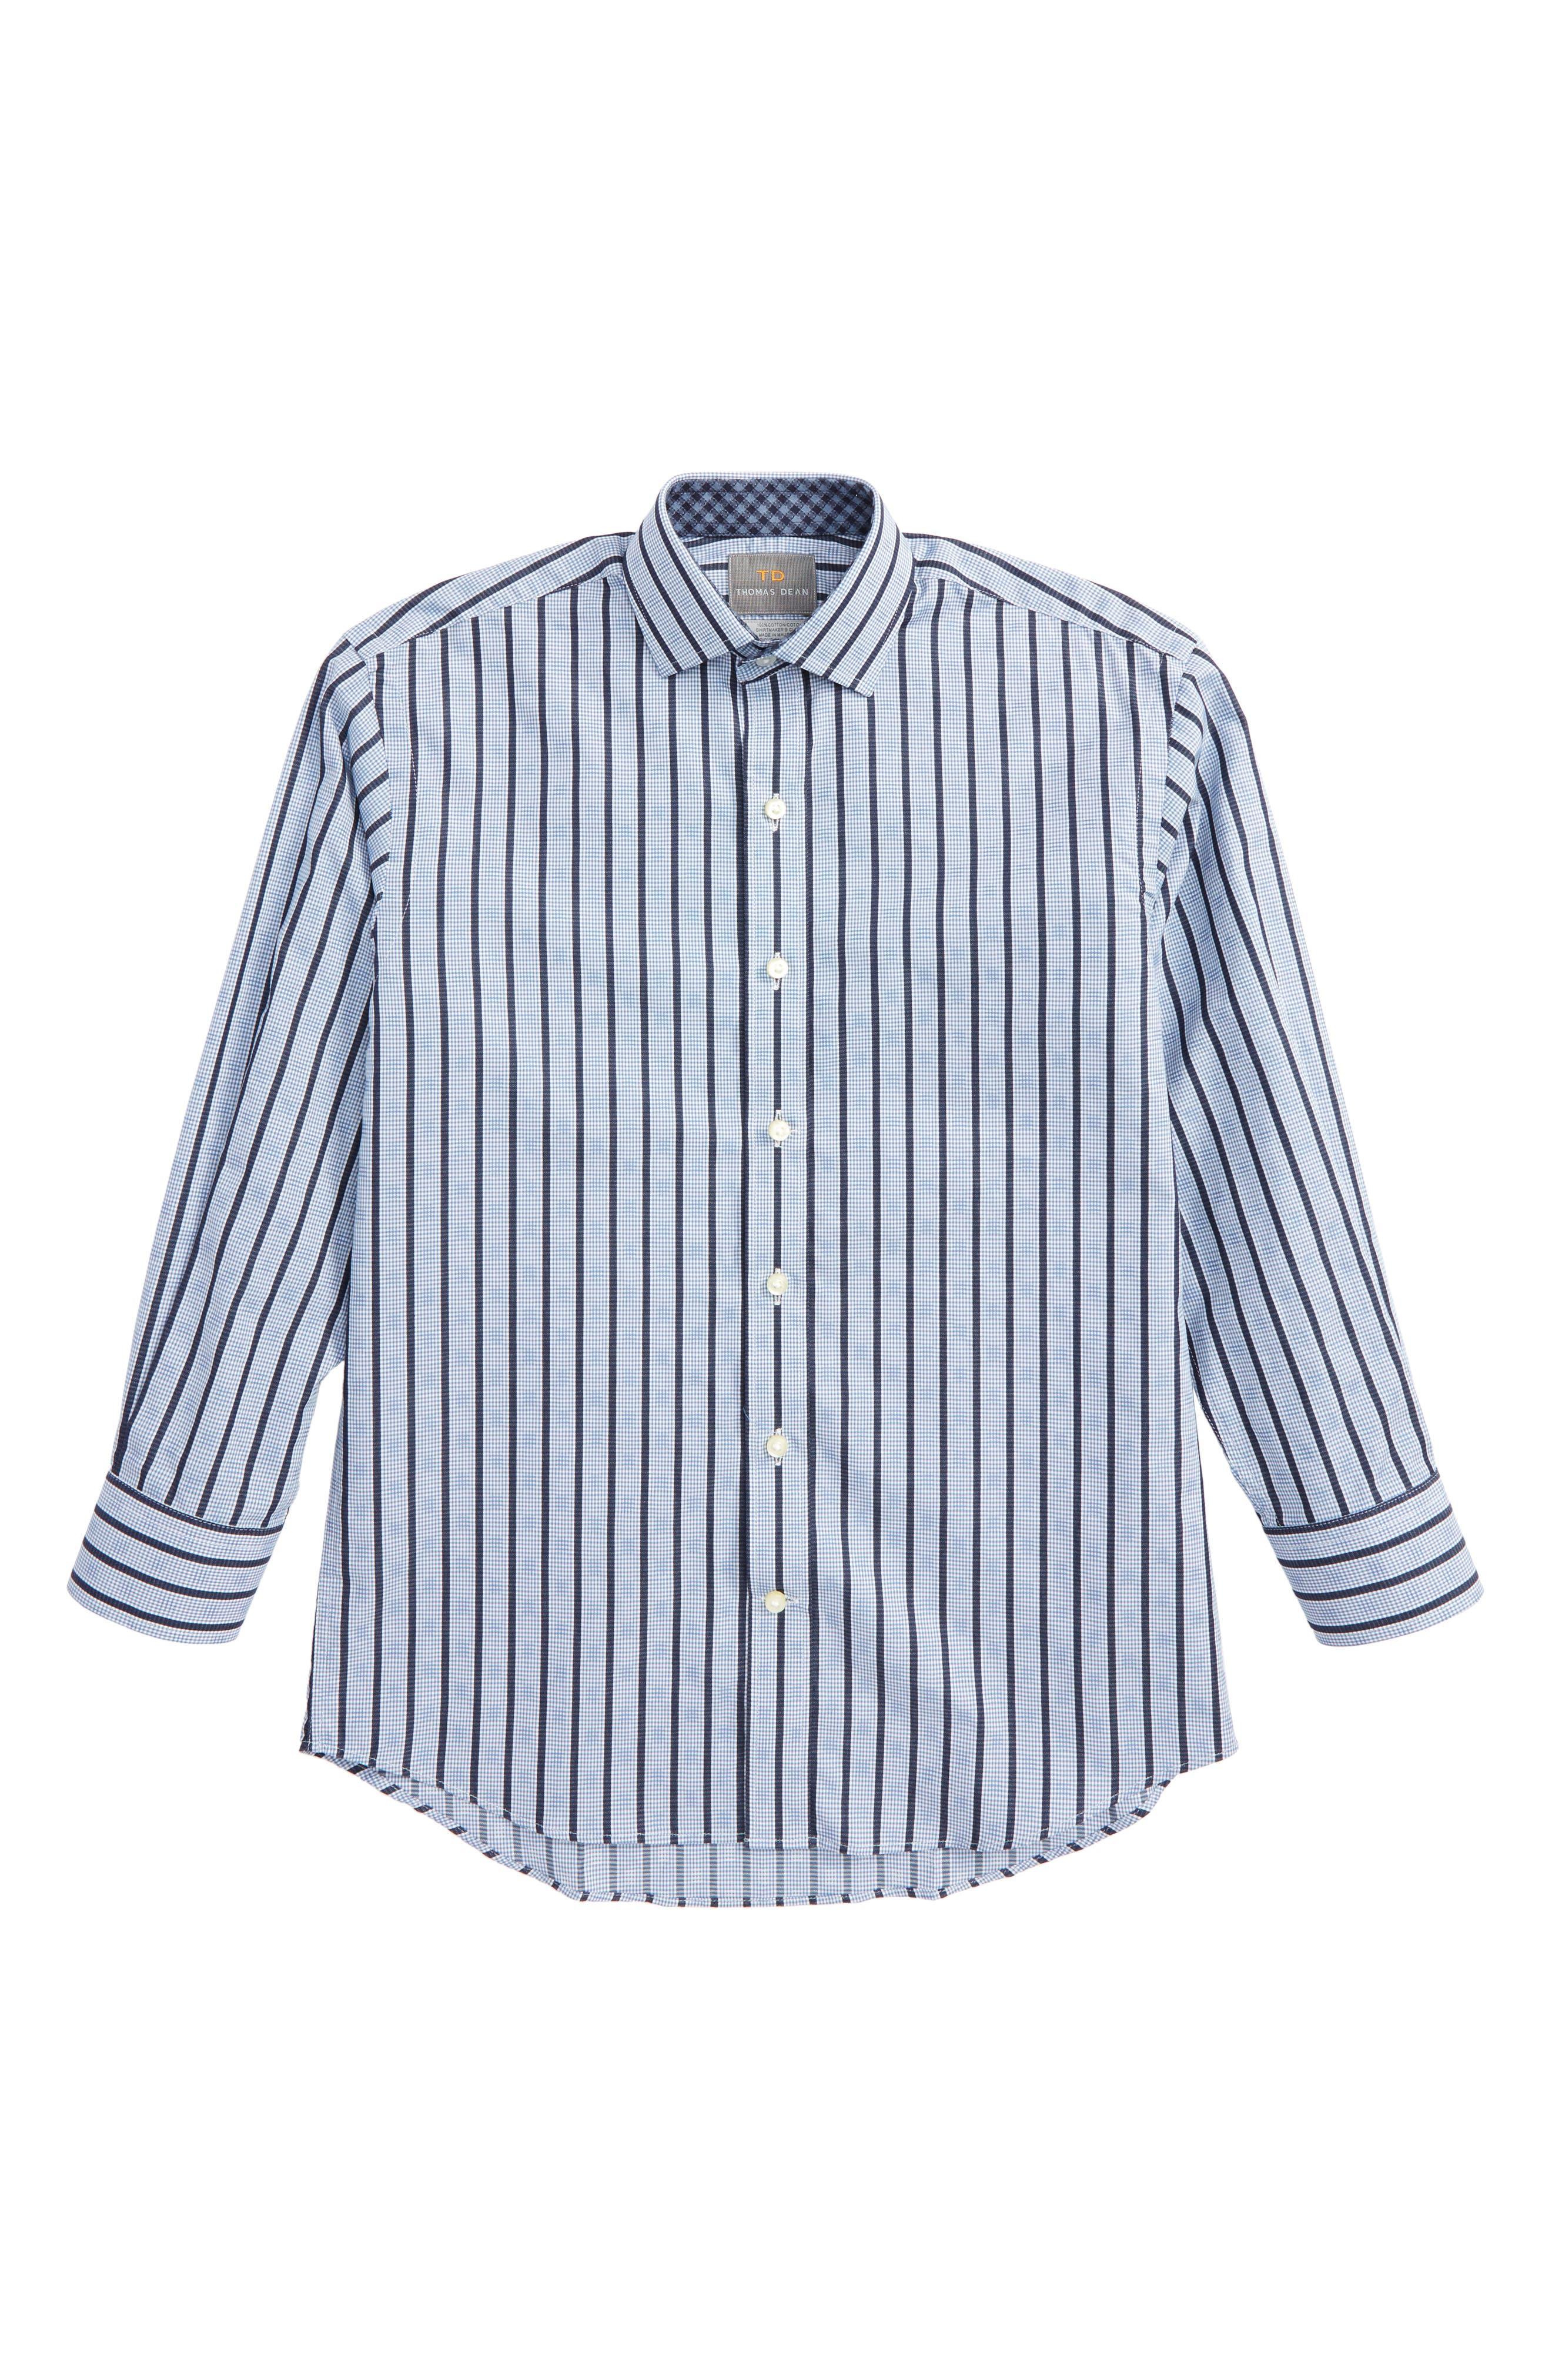 Main Image - Thomas Dean Stripe & Check Dress Shirt (Big Boys)